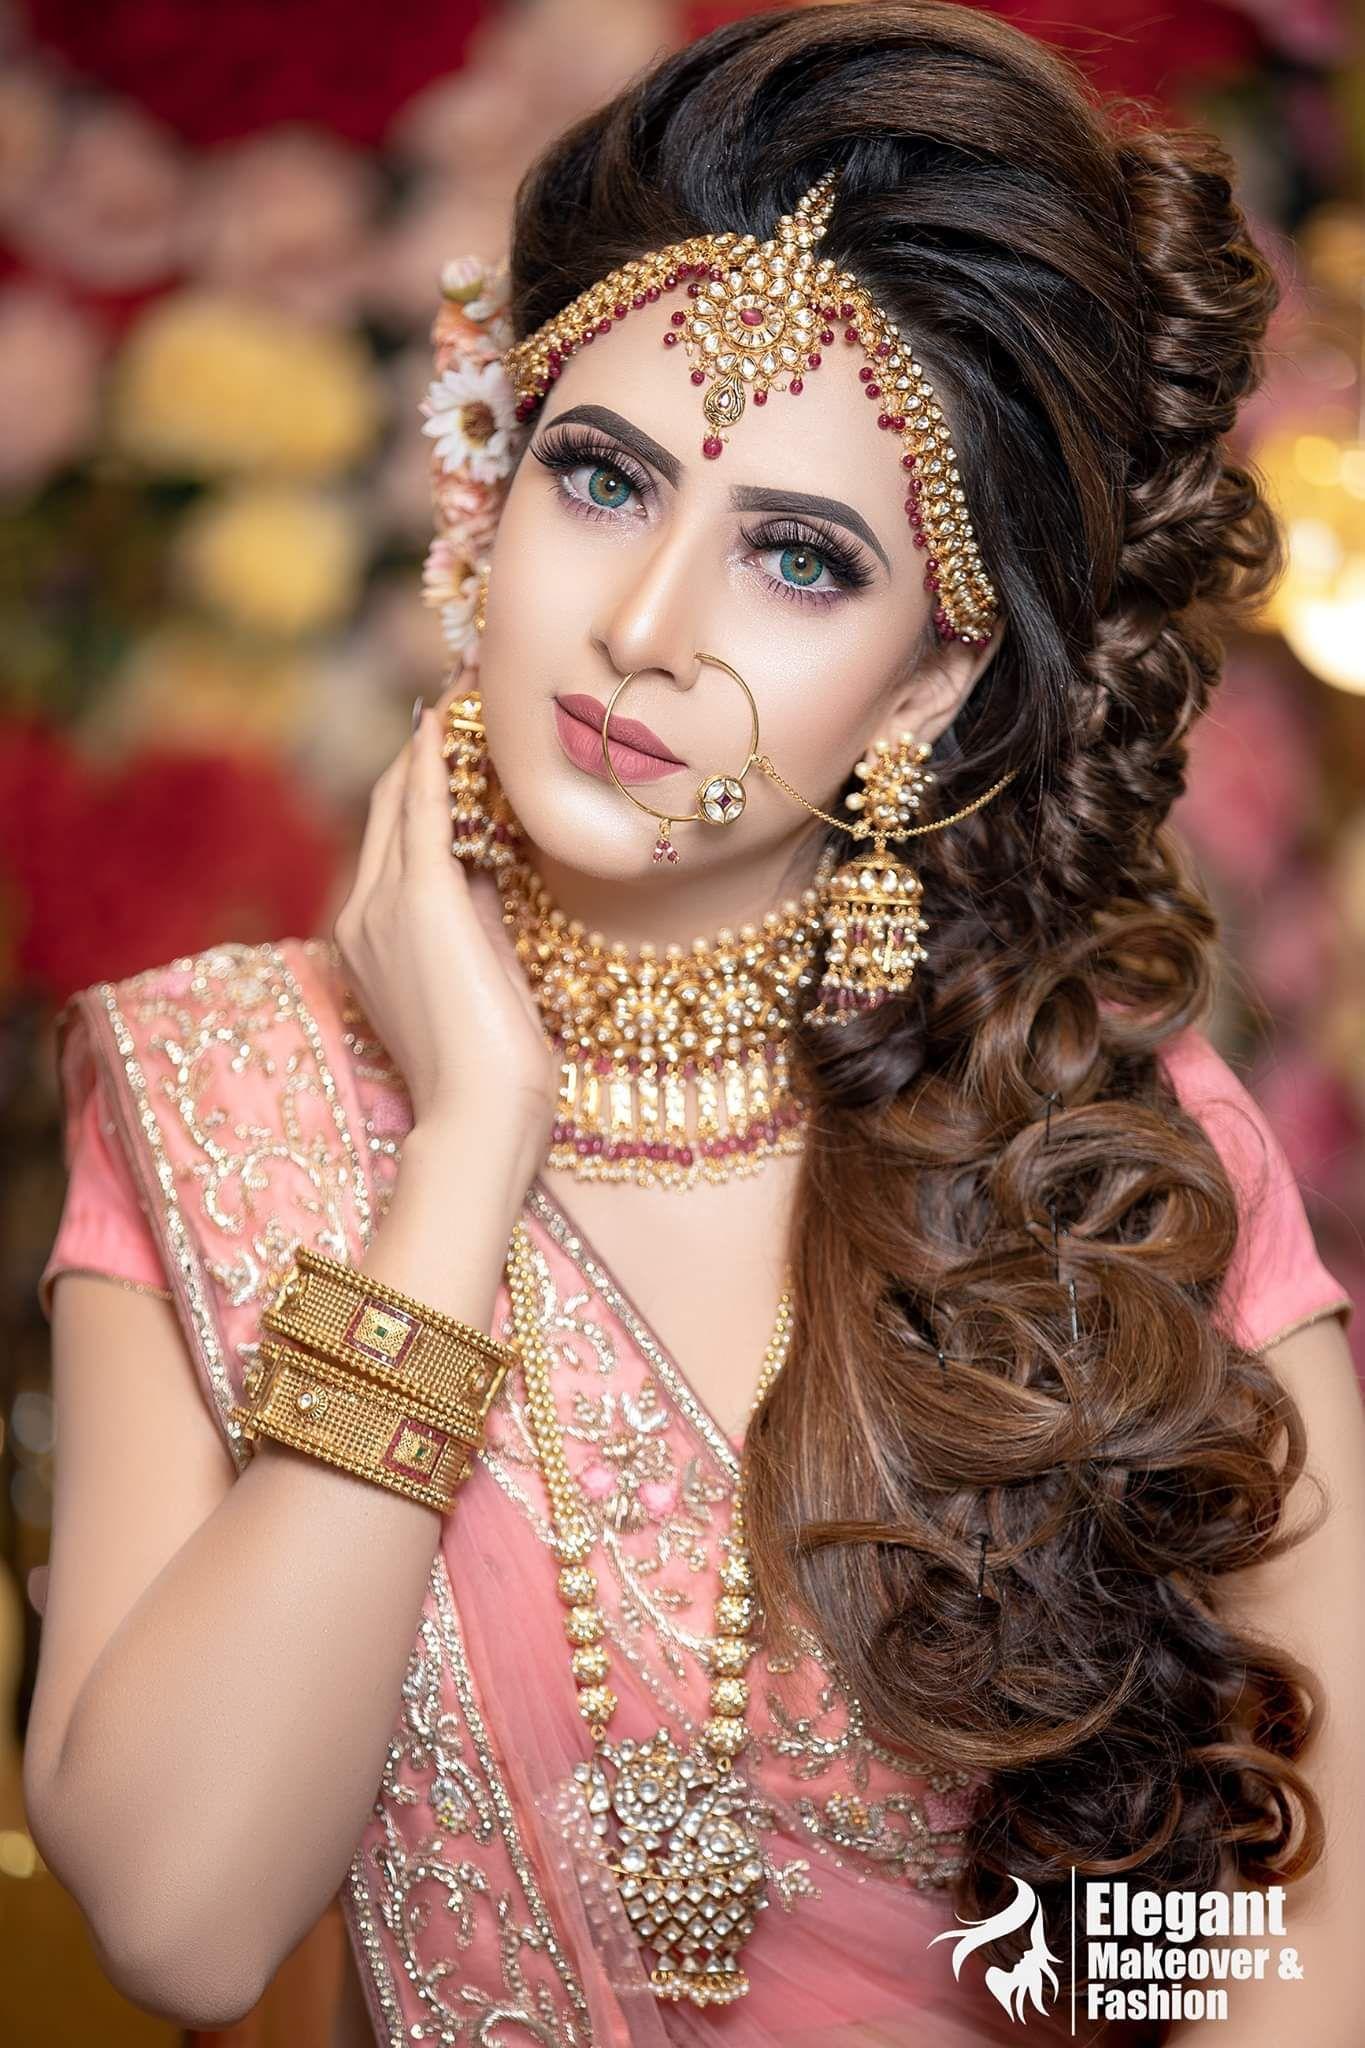 Beautiful wedding women indian bridal makeup bridal